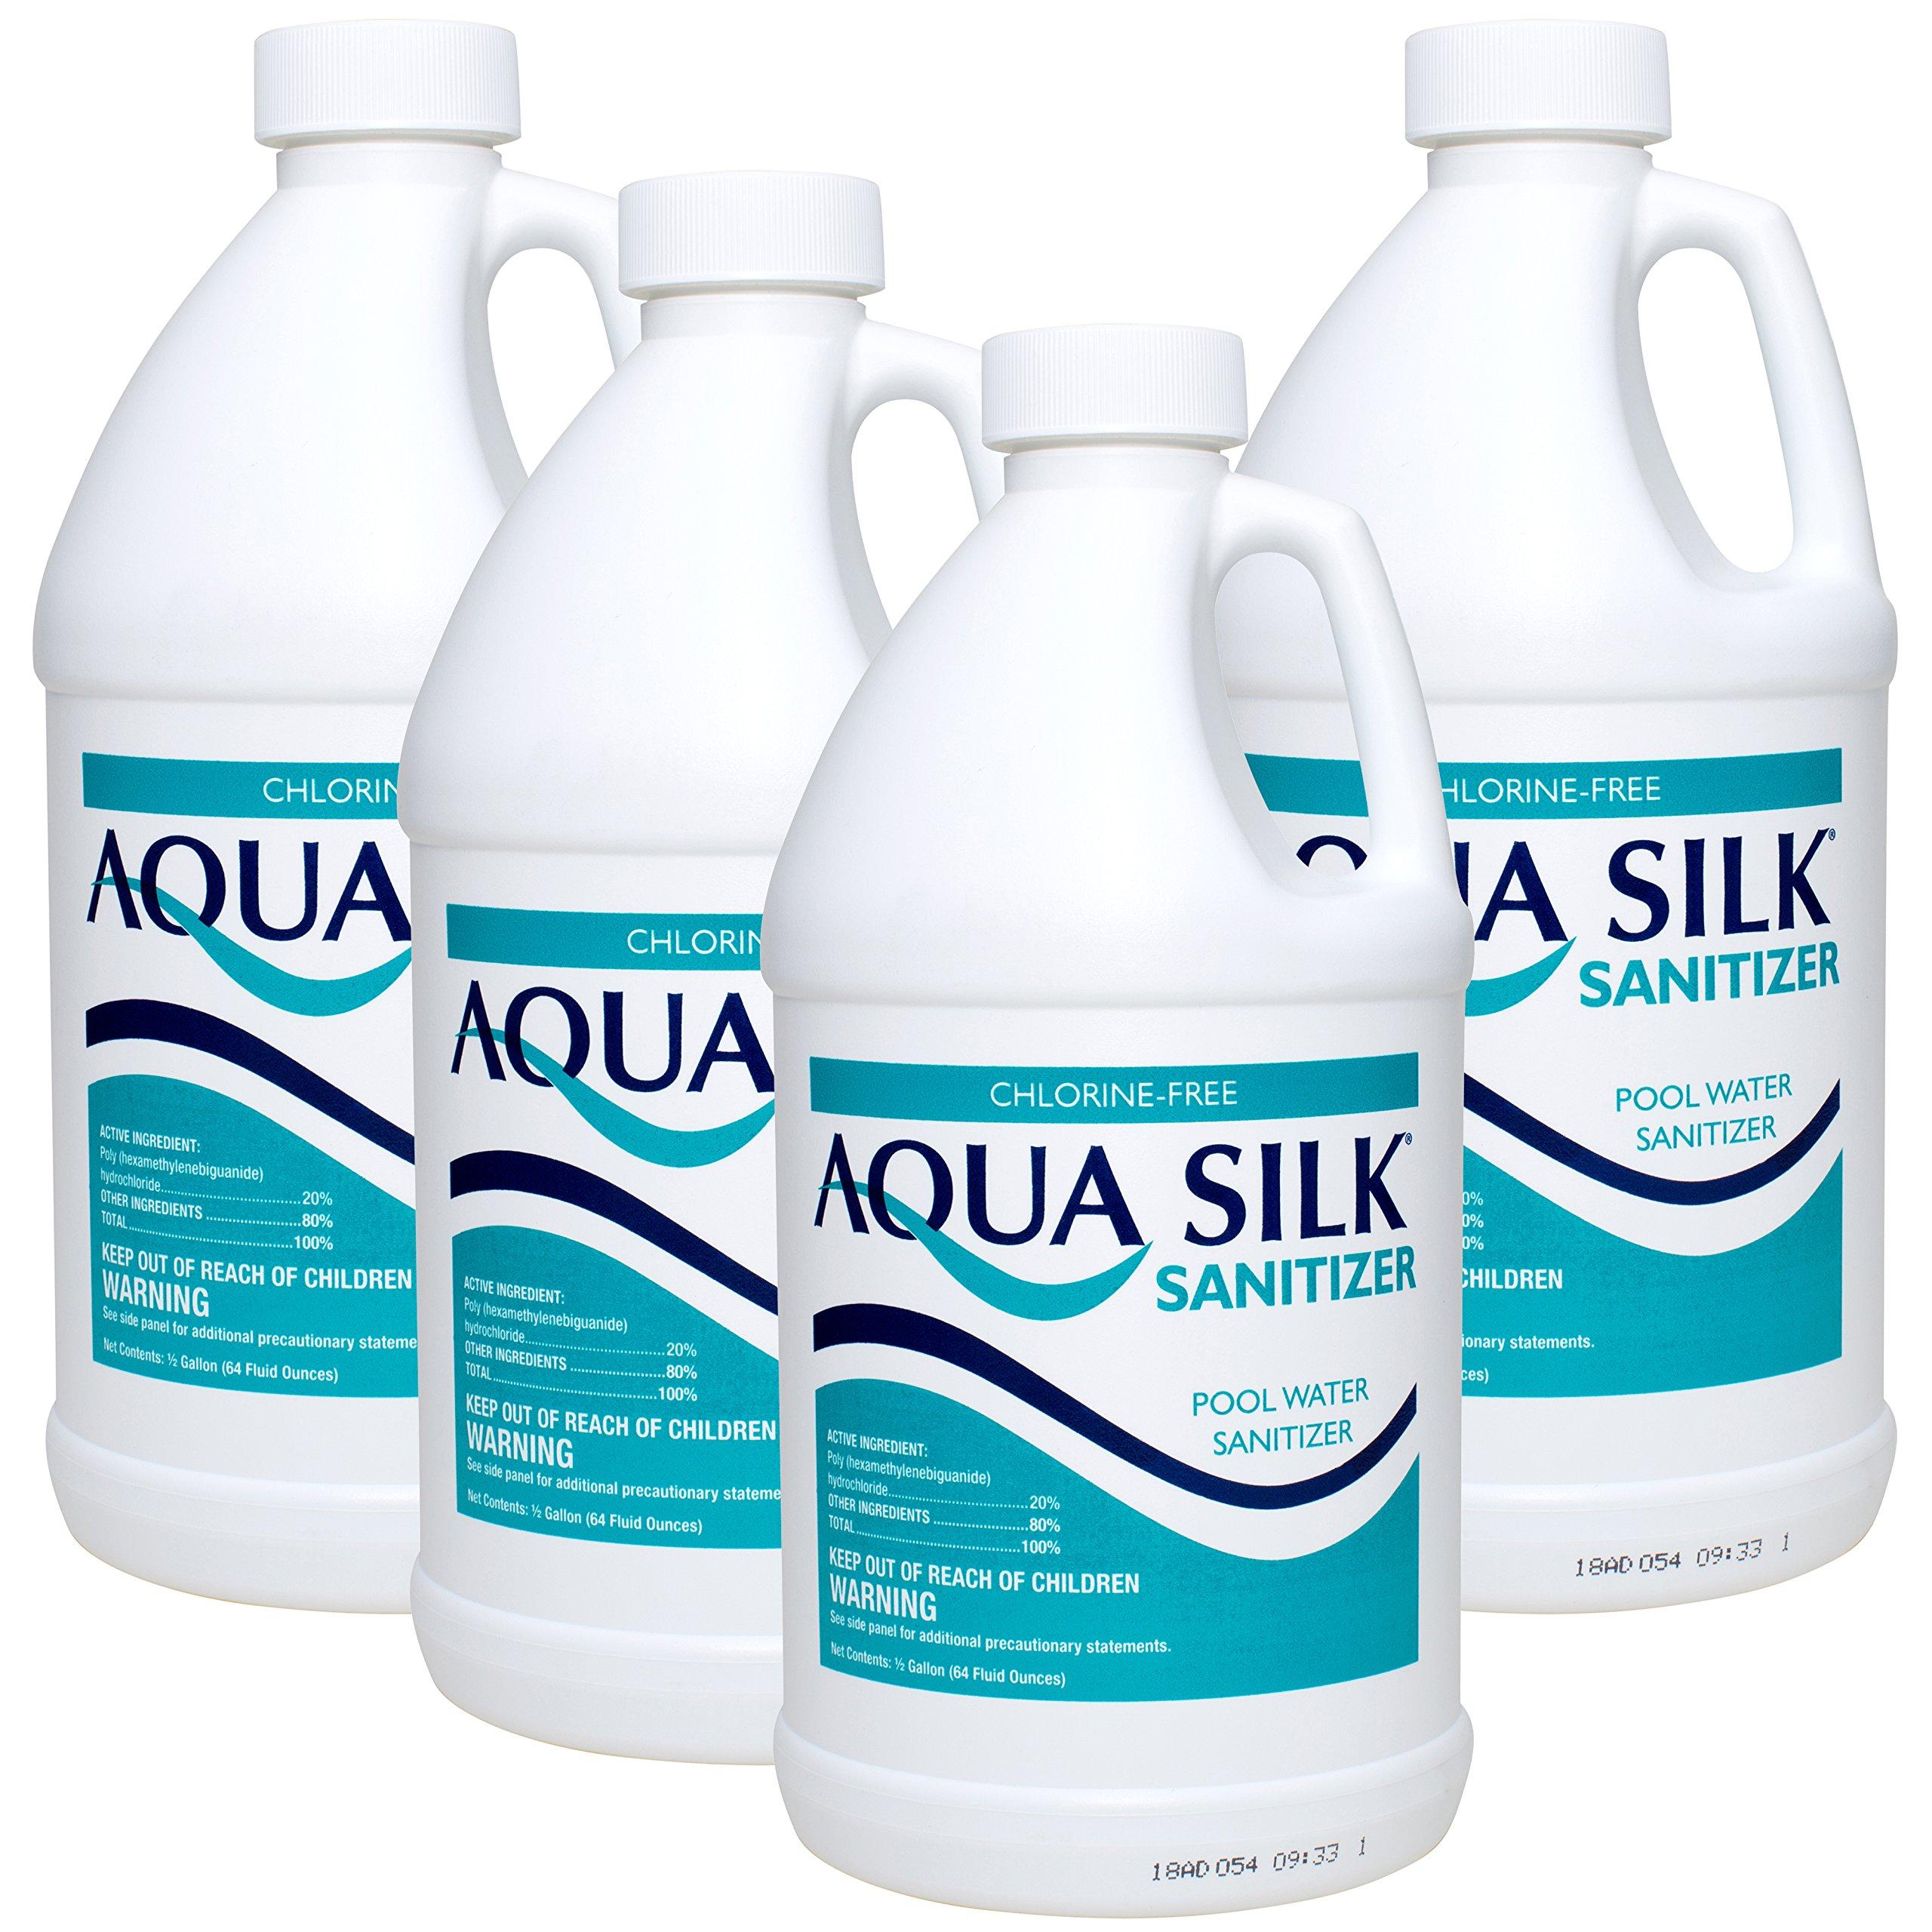 Aqua Silk Chorine-Free Sanitizer (0.5 gal) (4 Pack)